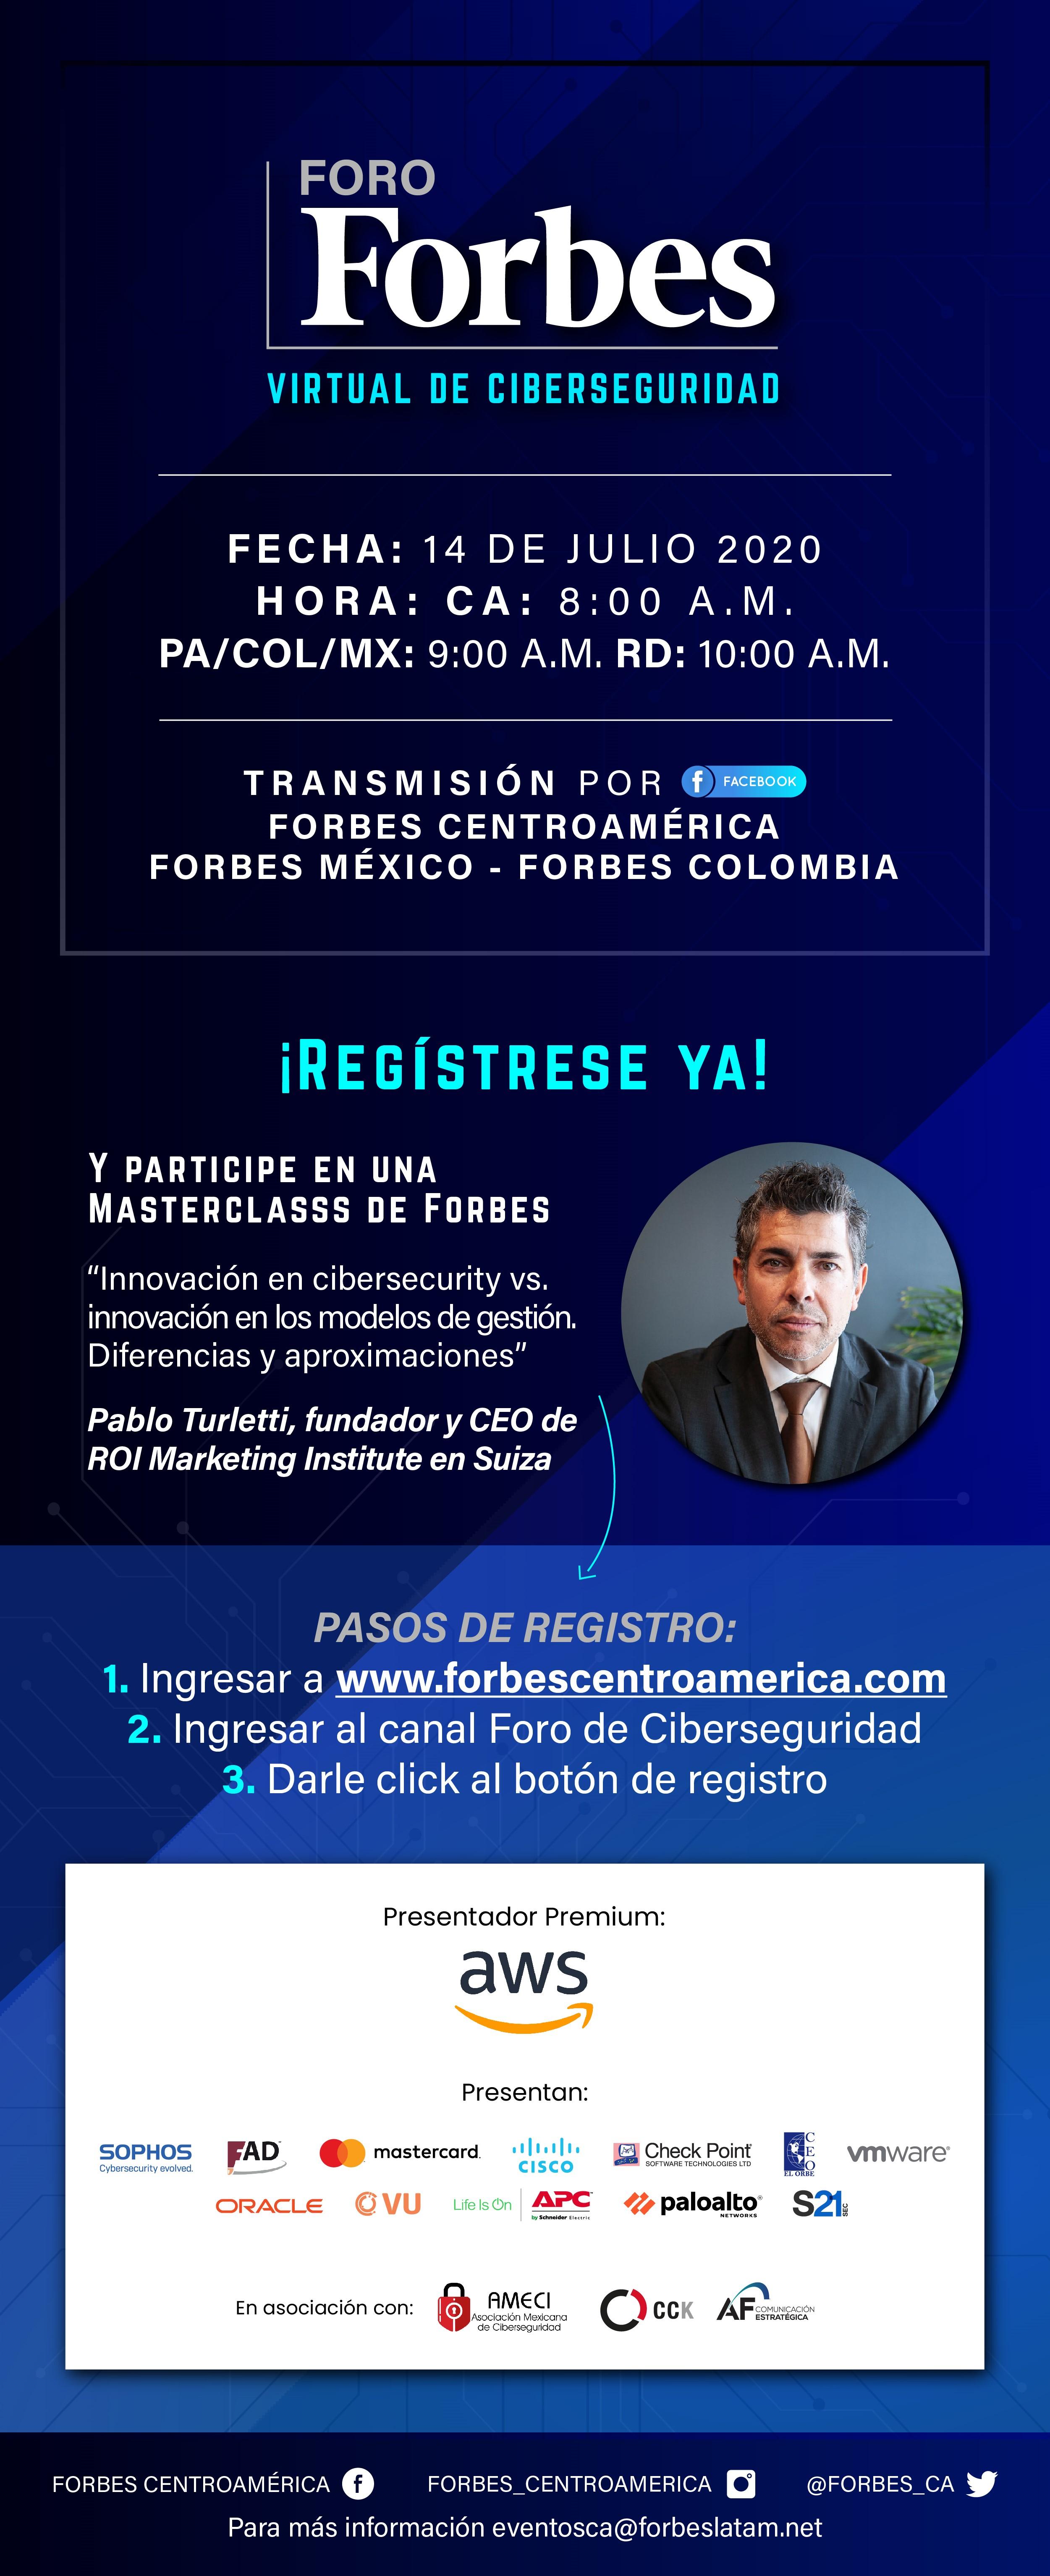 Diseño Foro Forbes Ciberseguridad 2020